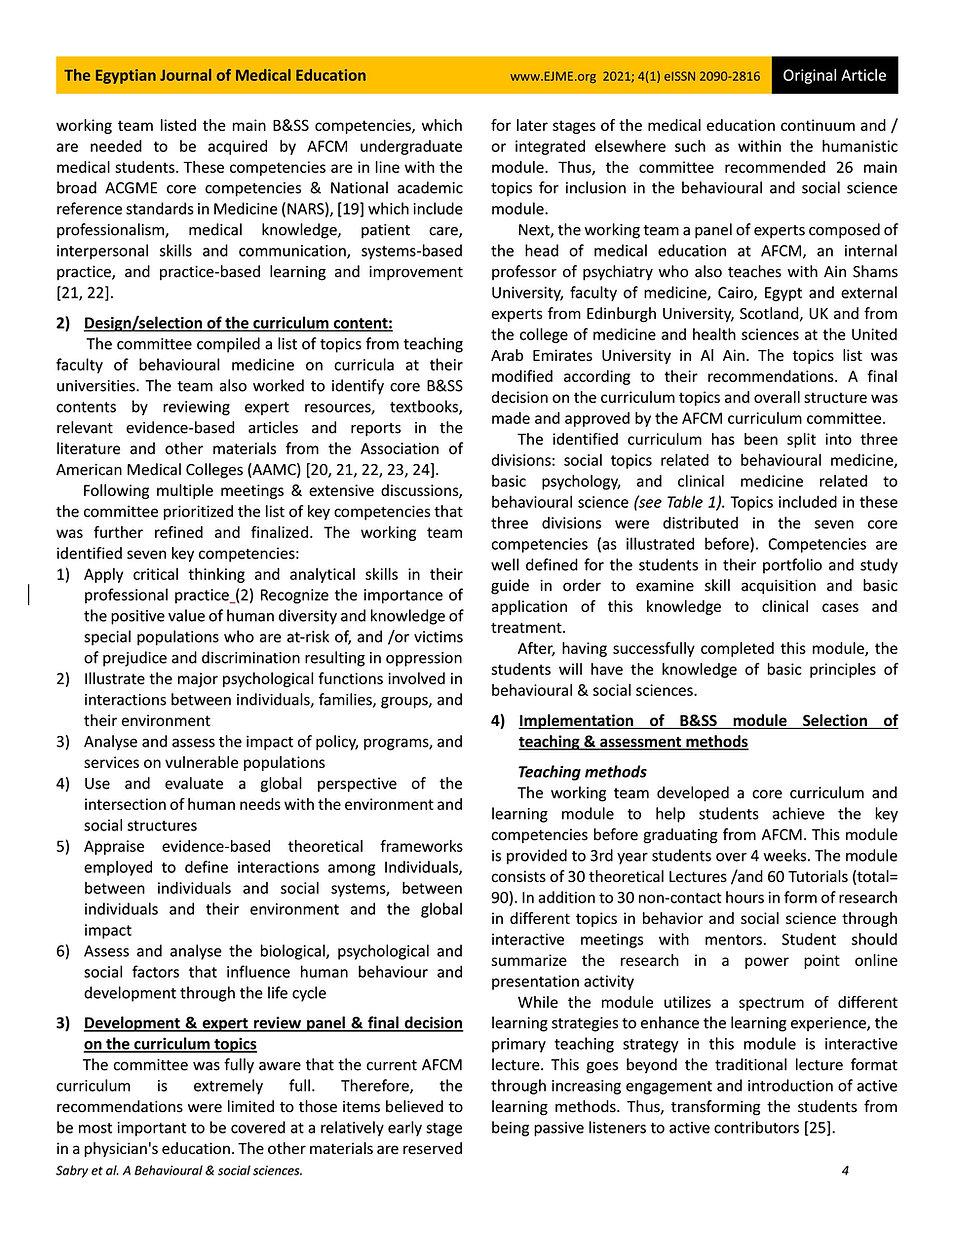 B&SS paper EJME template_4.jpg